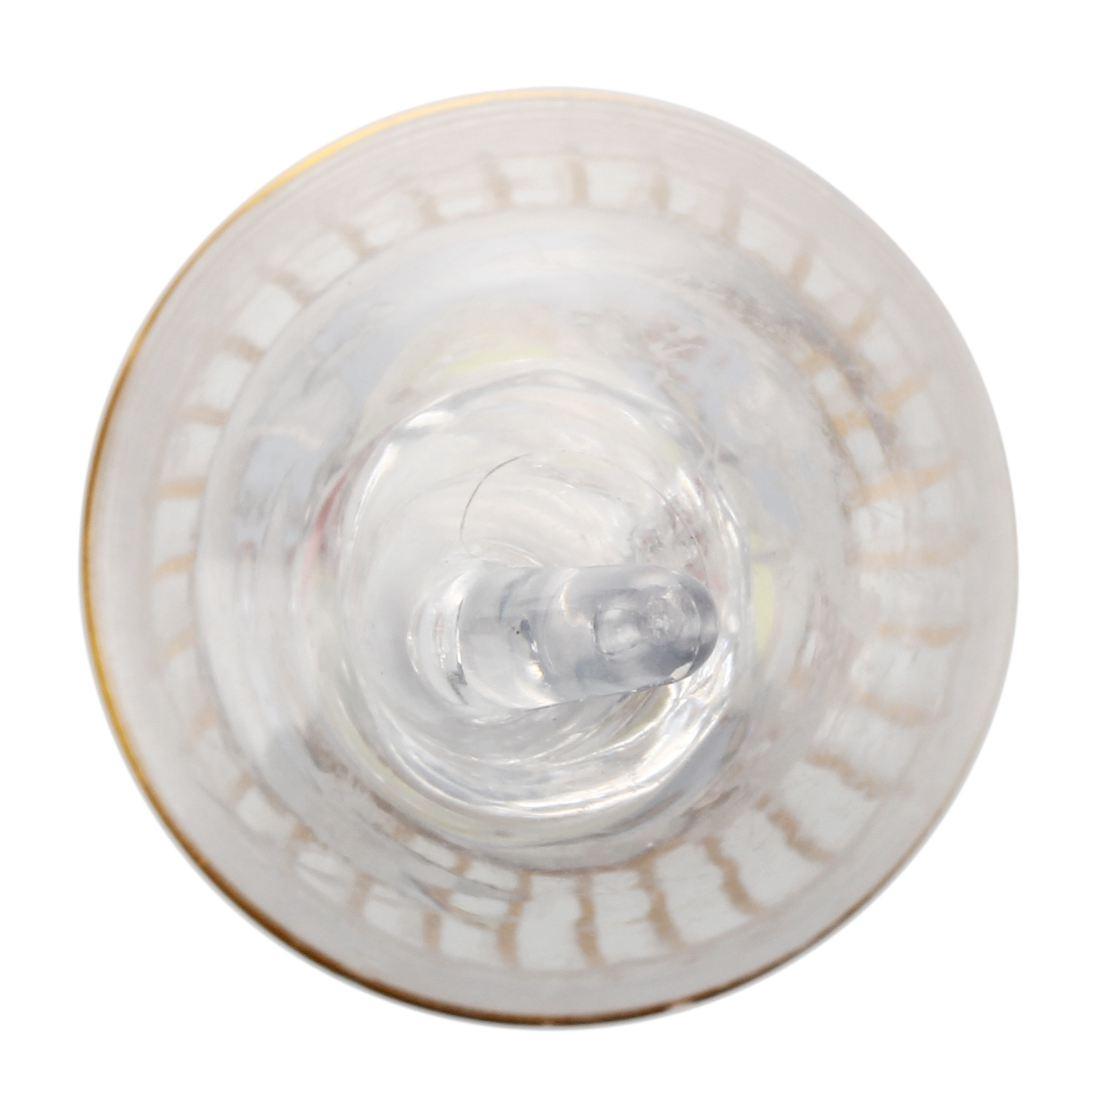 Brand New B22 3W Warm White LED Candelabra Chandelier Candle Light Bulb Base type ; Wattage:B22 Golden 3W Light Color:Warm White